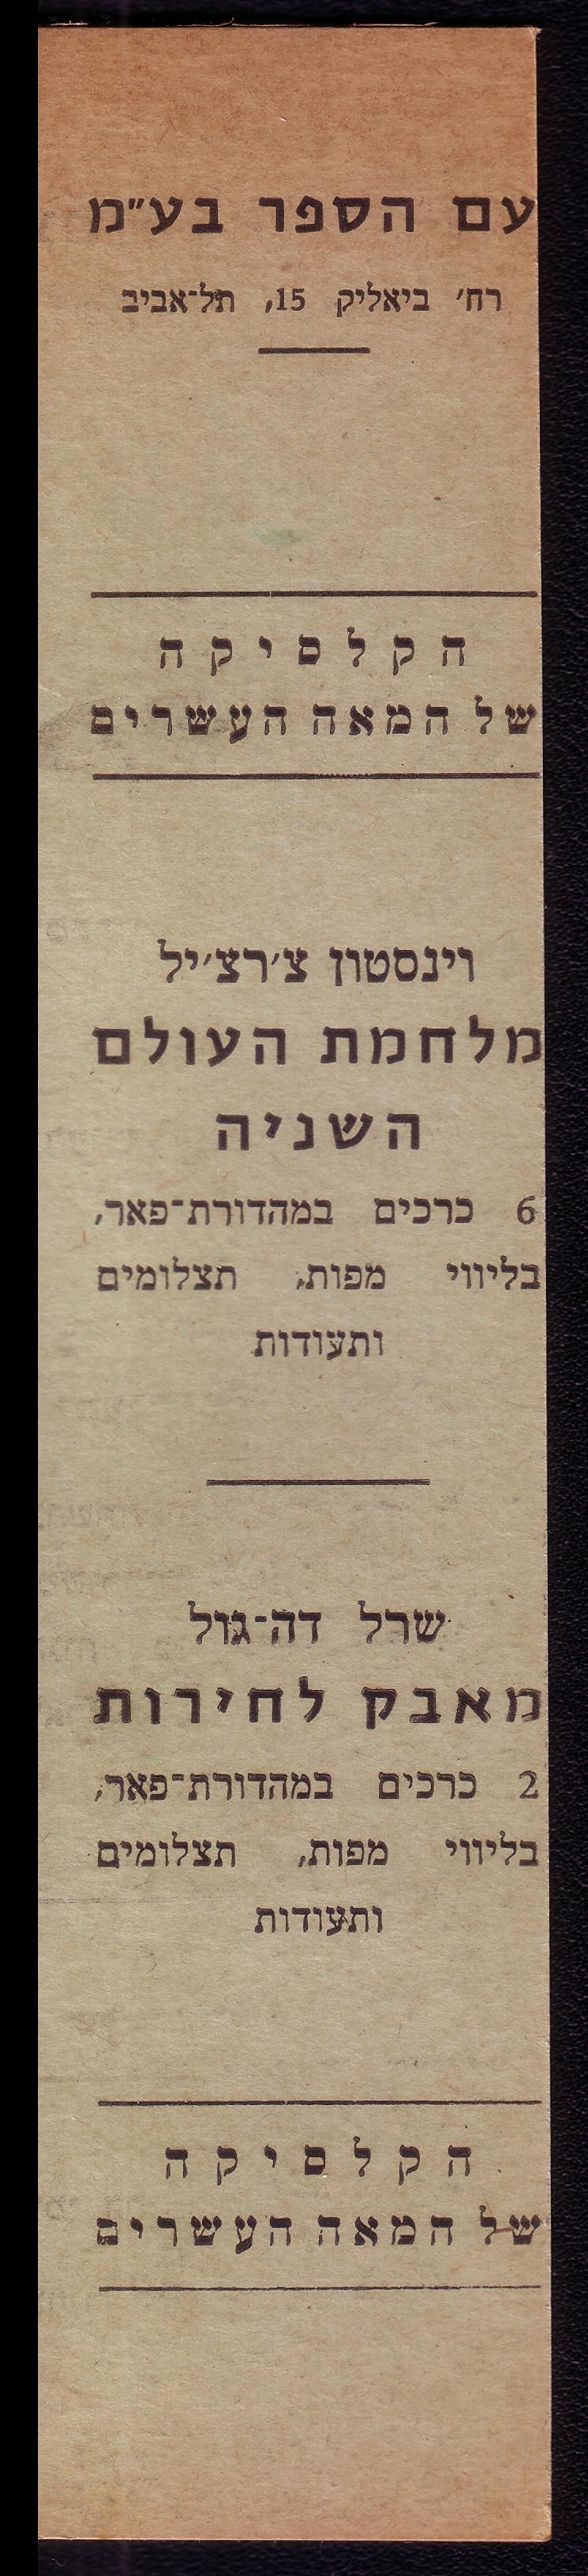 Am Hasefer, ad 1958